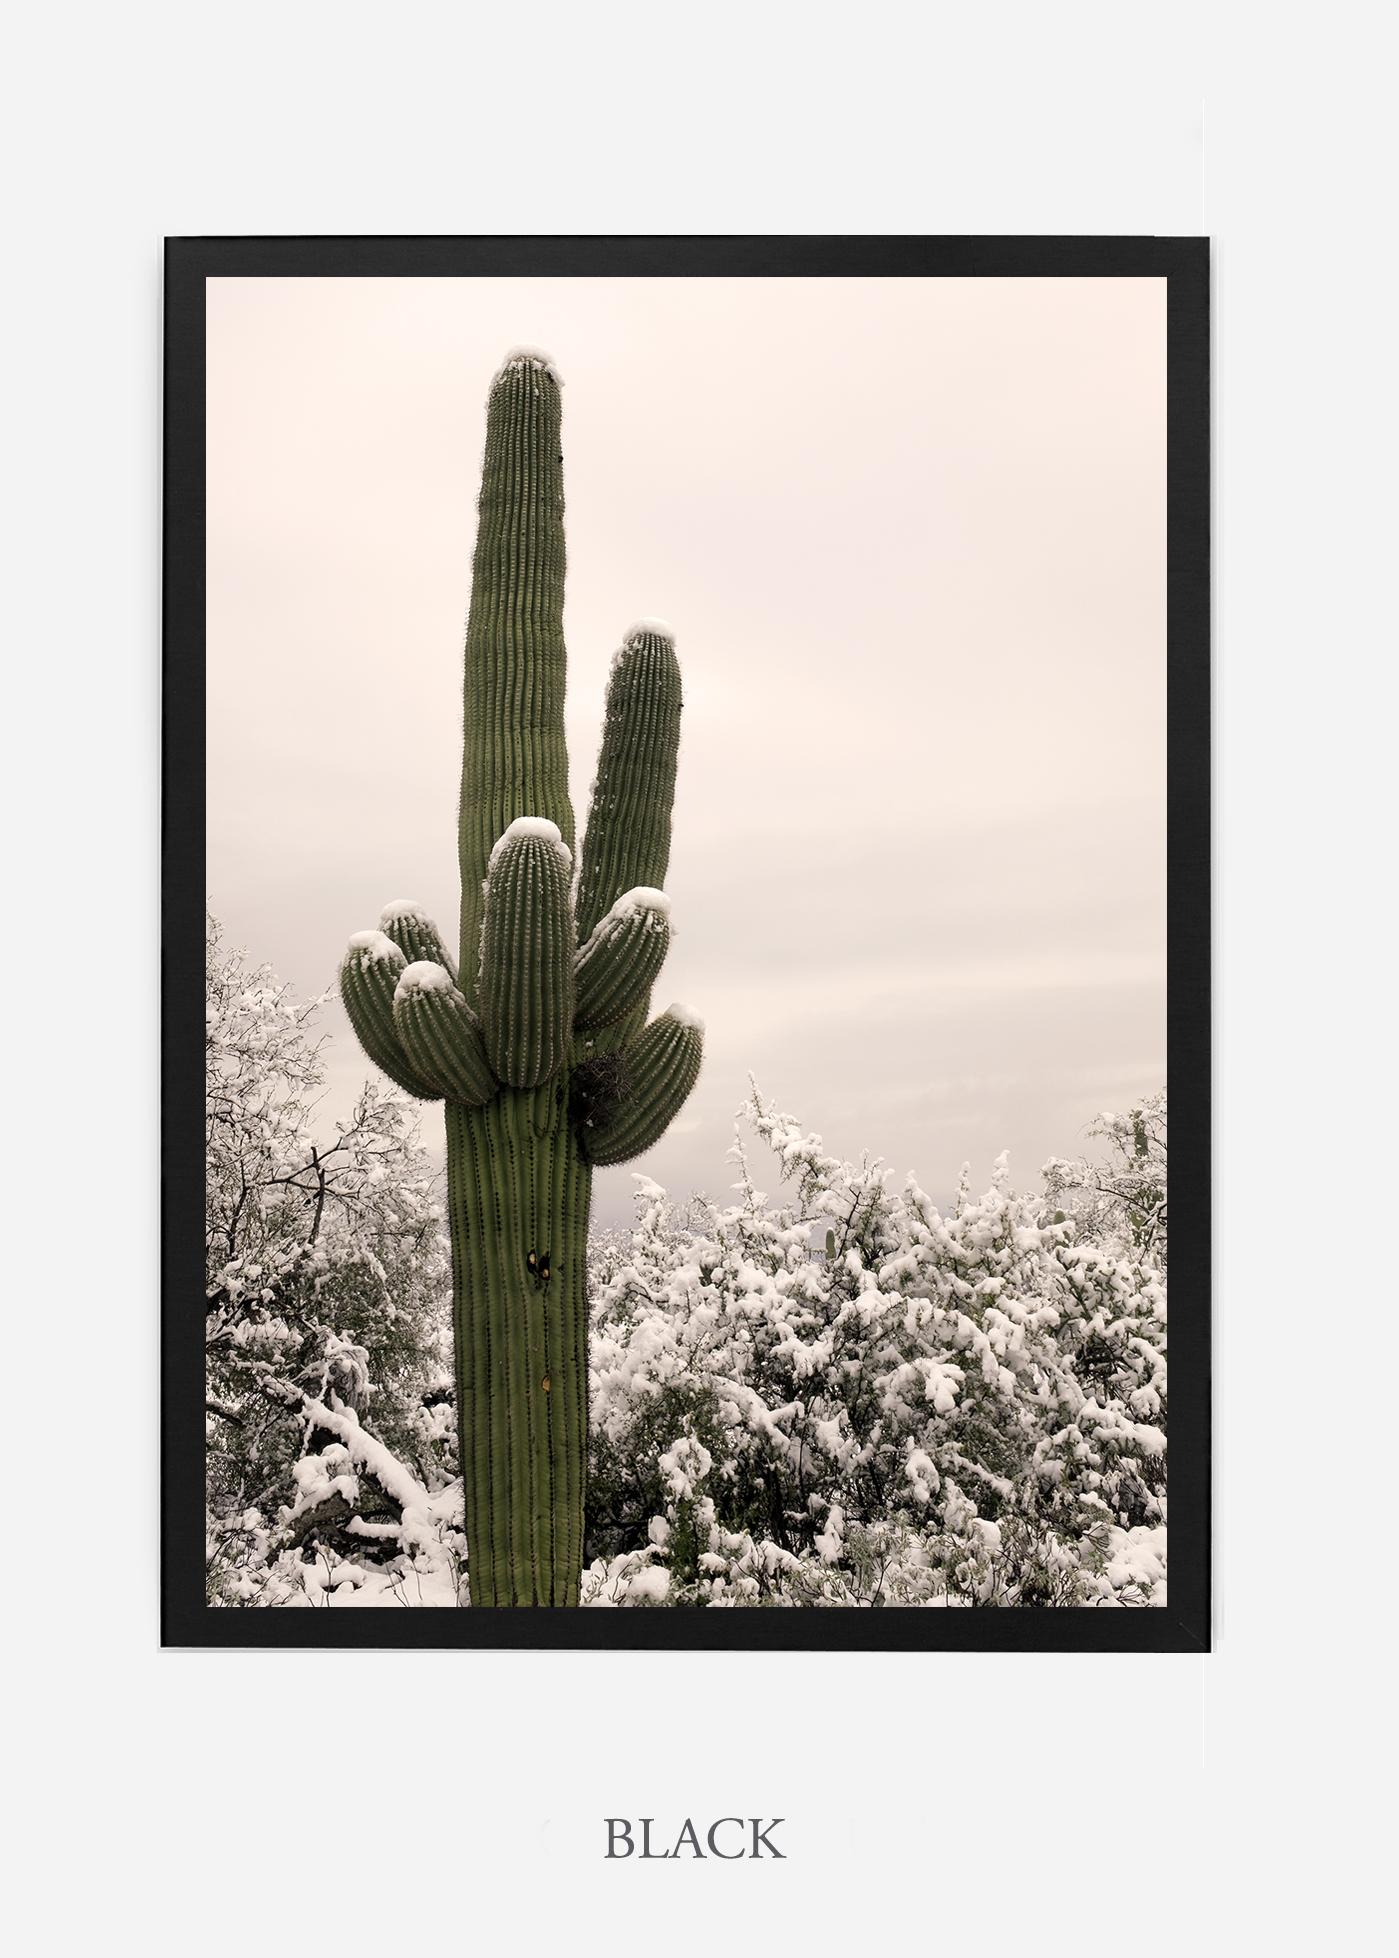 nomat-blackframe-saguaroNo.6-wildercalifornia-art-wallart-cactusprint-homedecor-prints-arizona-botanical-artwork-interiordesign.jpg